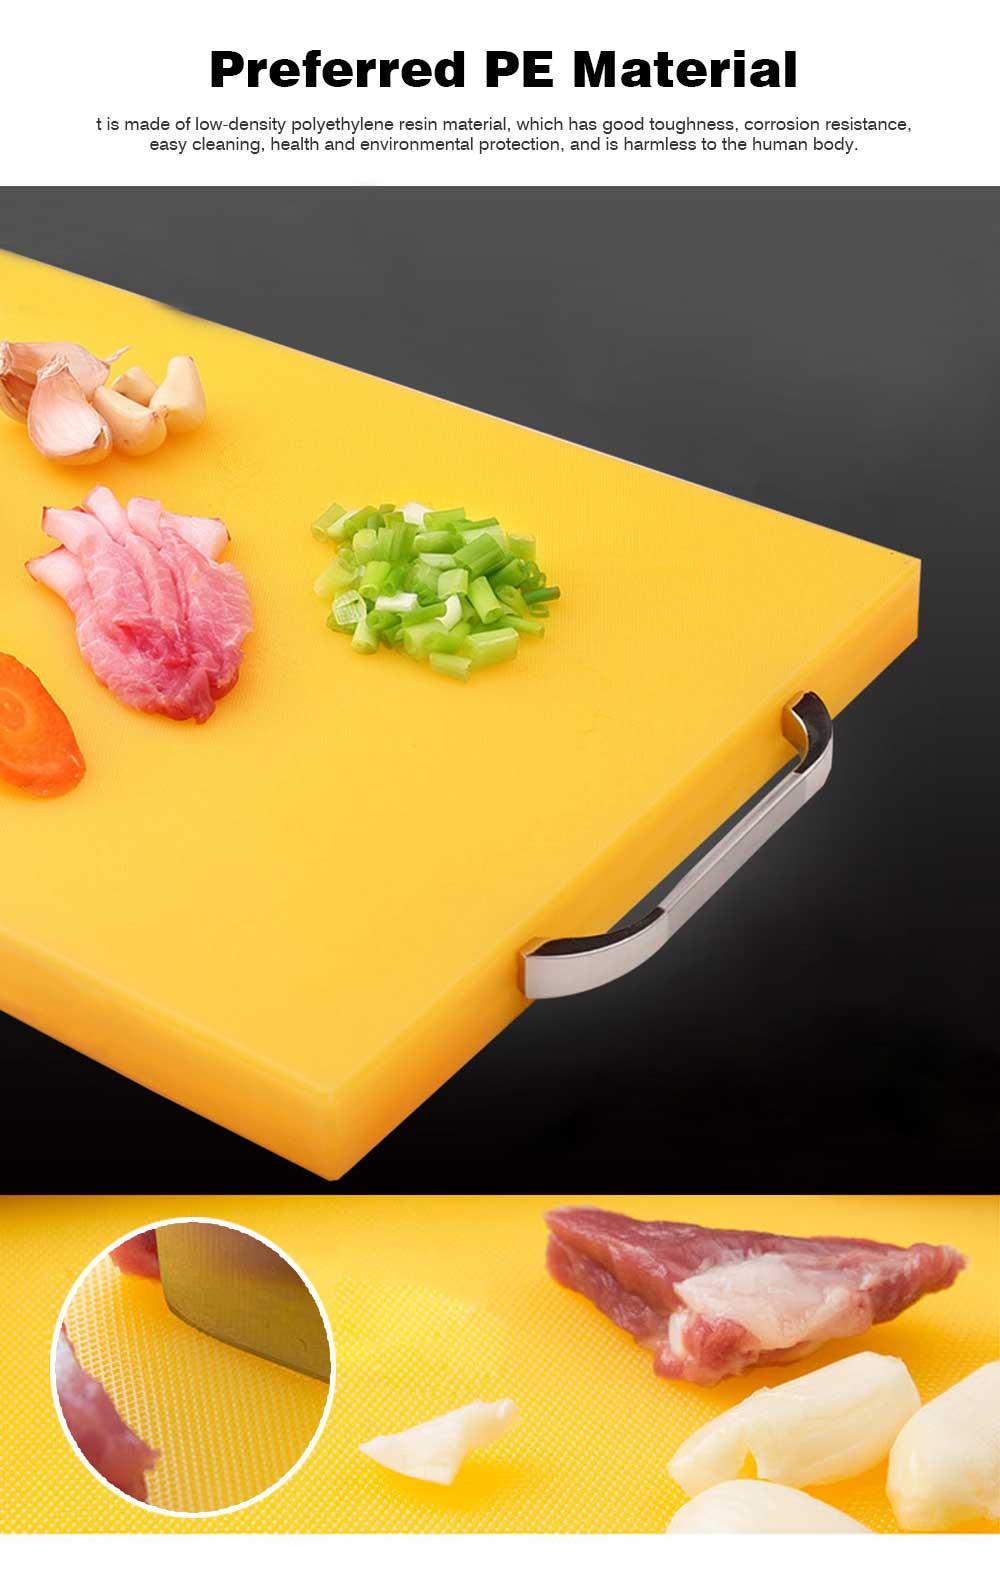 Anti-slip Multi-function Cutting Board, High-quality PE Cutting Board for Cutting Cooked Food, Vegetables, Fruits 1